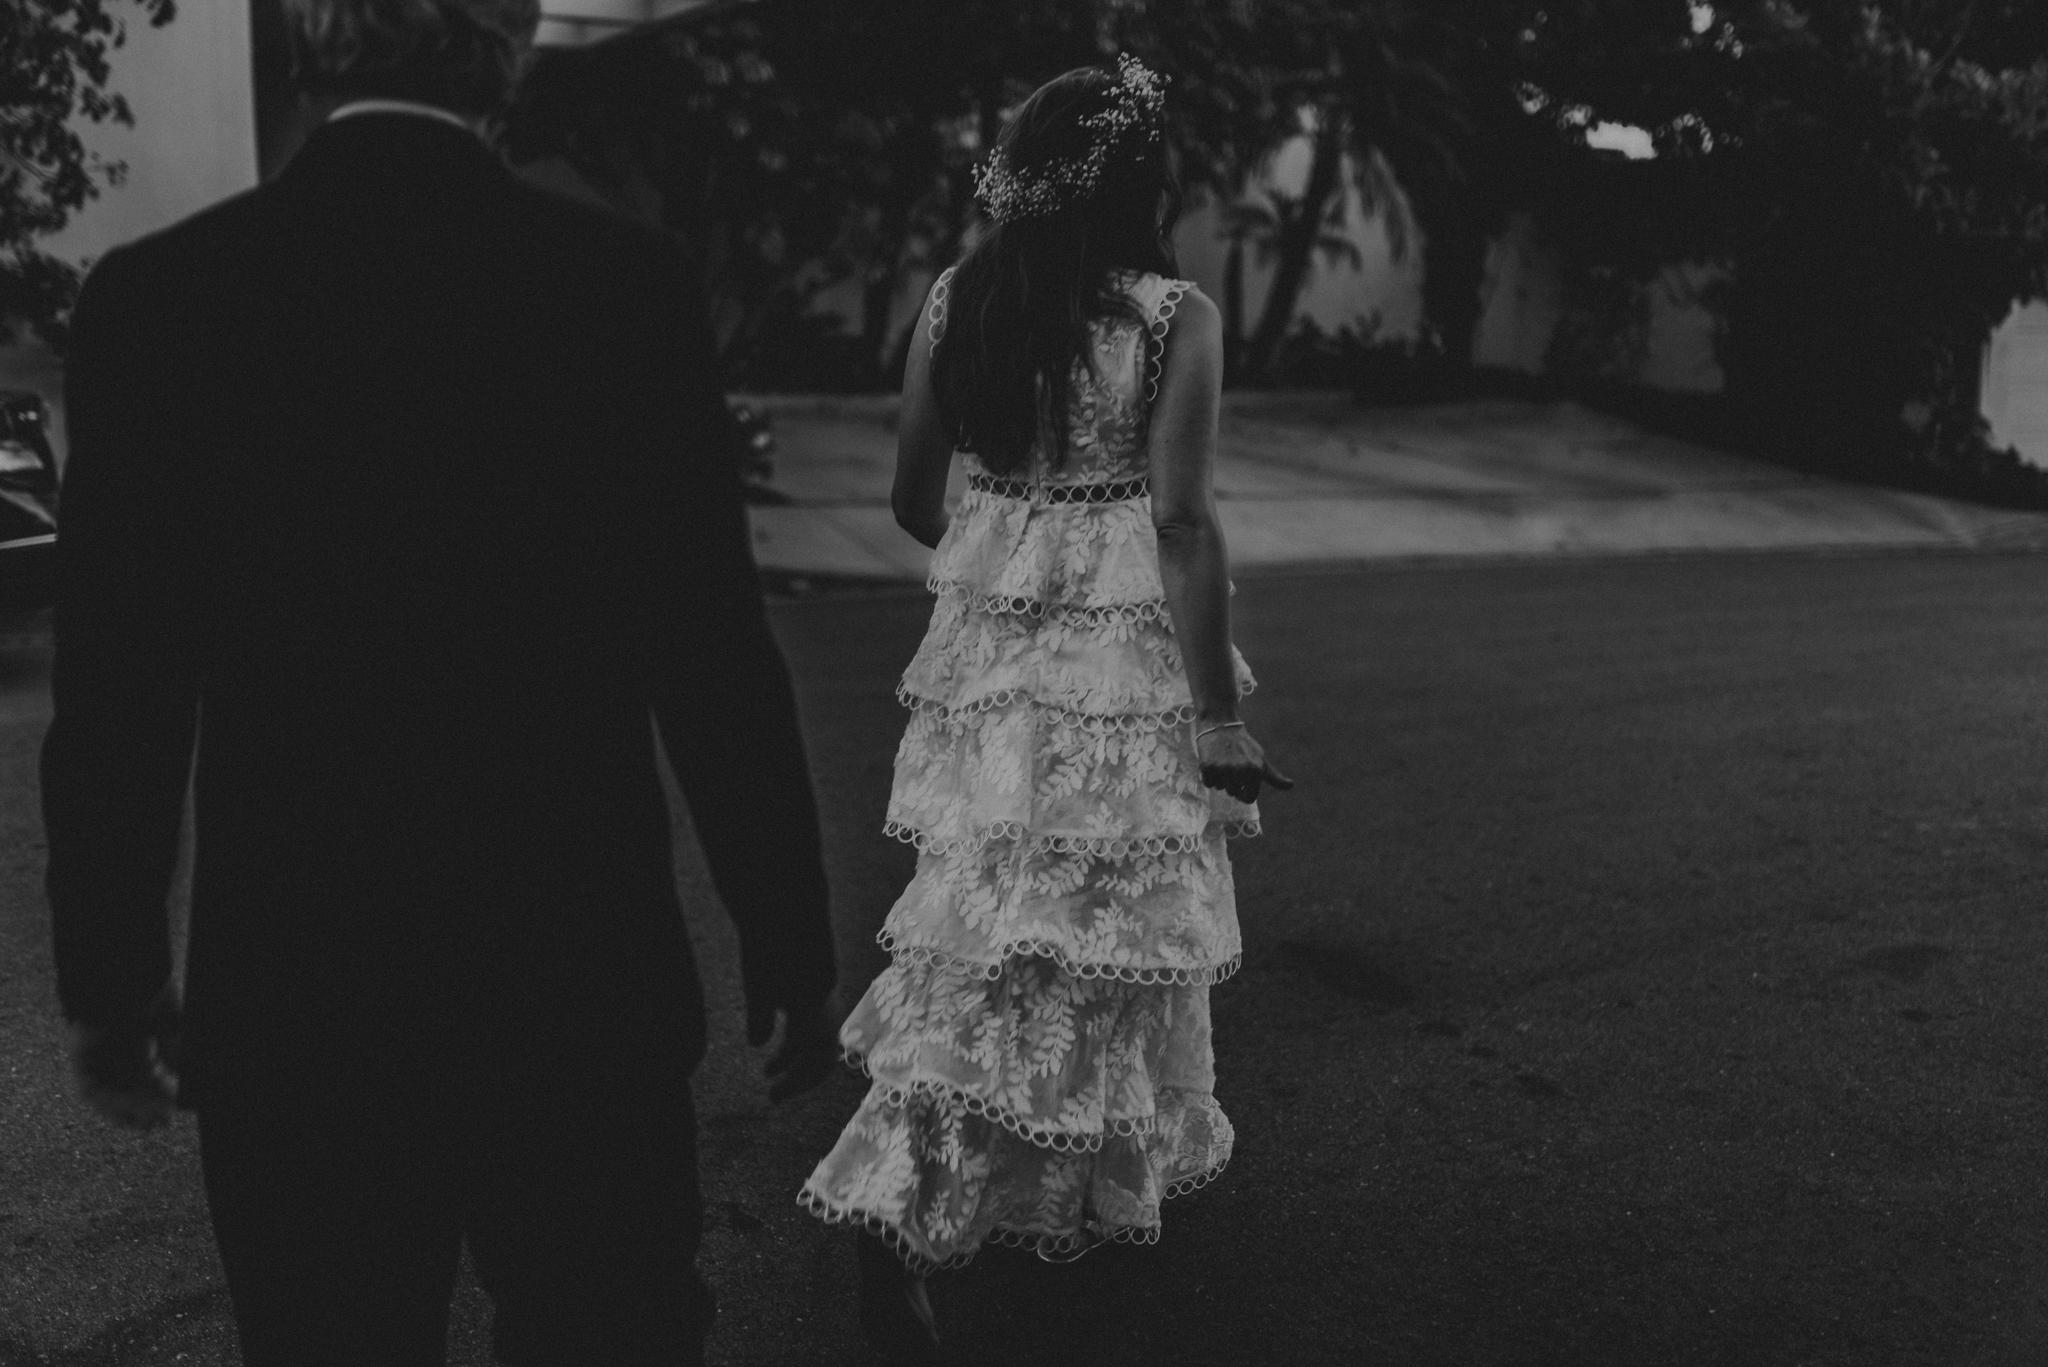 Isaiah + Taylor Photography - Private Estate Backyard Wedding - Beverly Hills - Los Angeles Wedding Photographer - 106.jpg